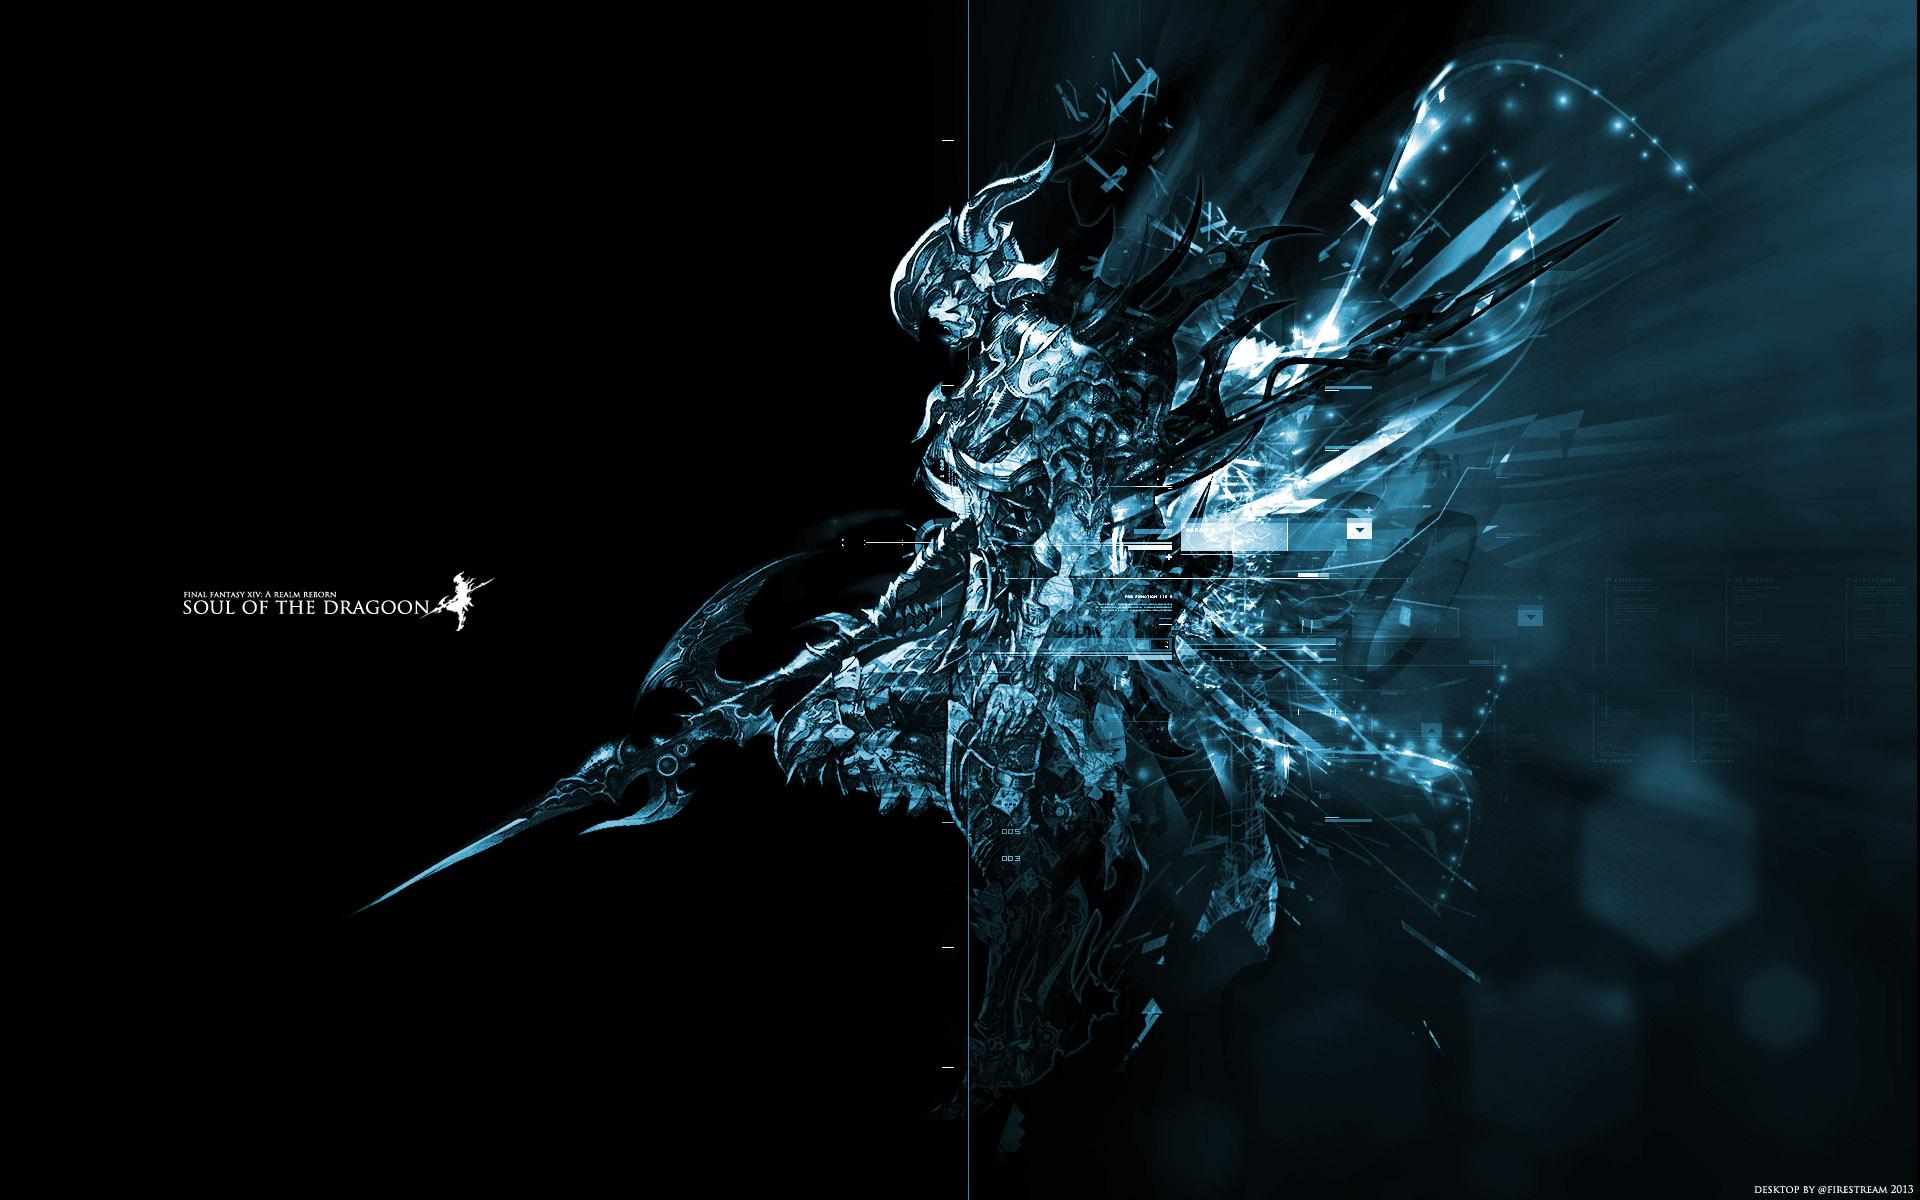 Final Fantasy Xiv A Realm Reborn Fantasy Art Wallpapers: [49+] FFXIV HD Wallpaper On WallpaperSafari